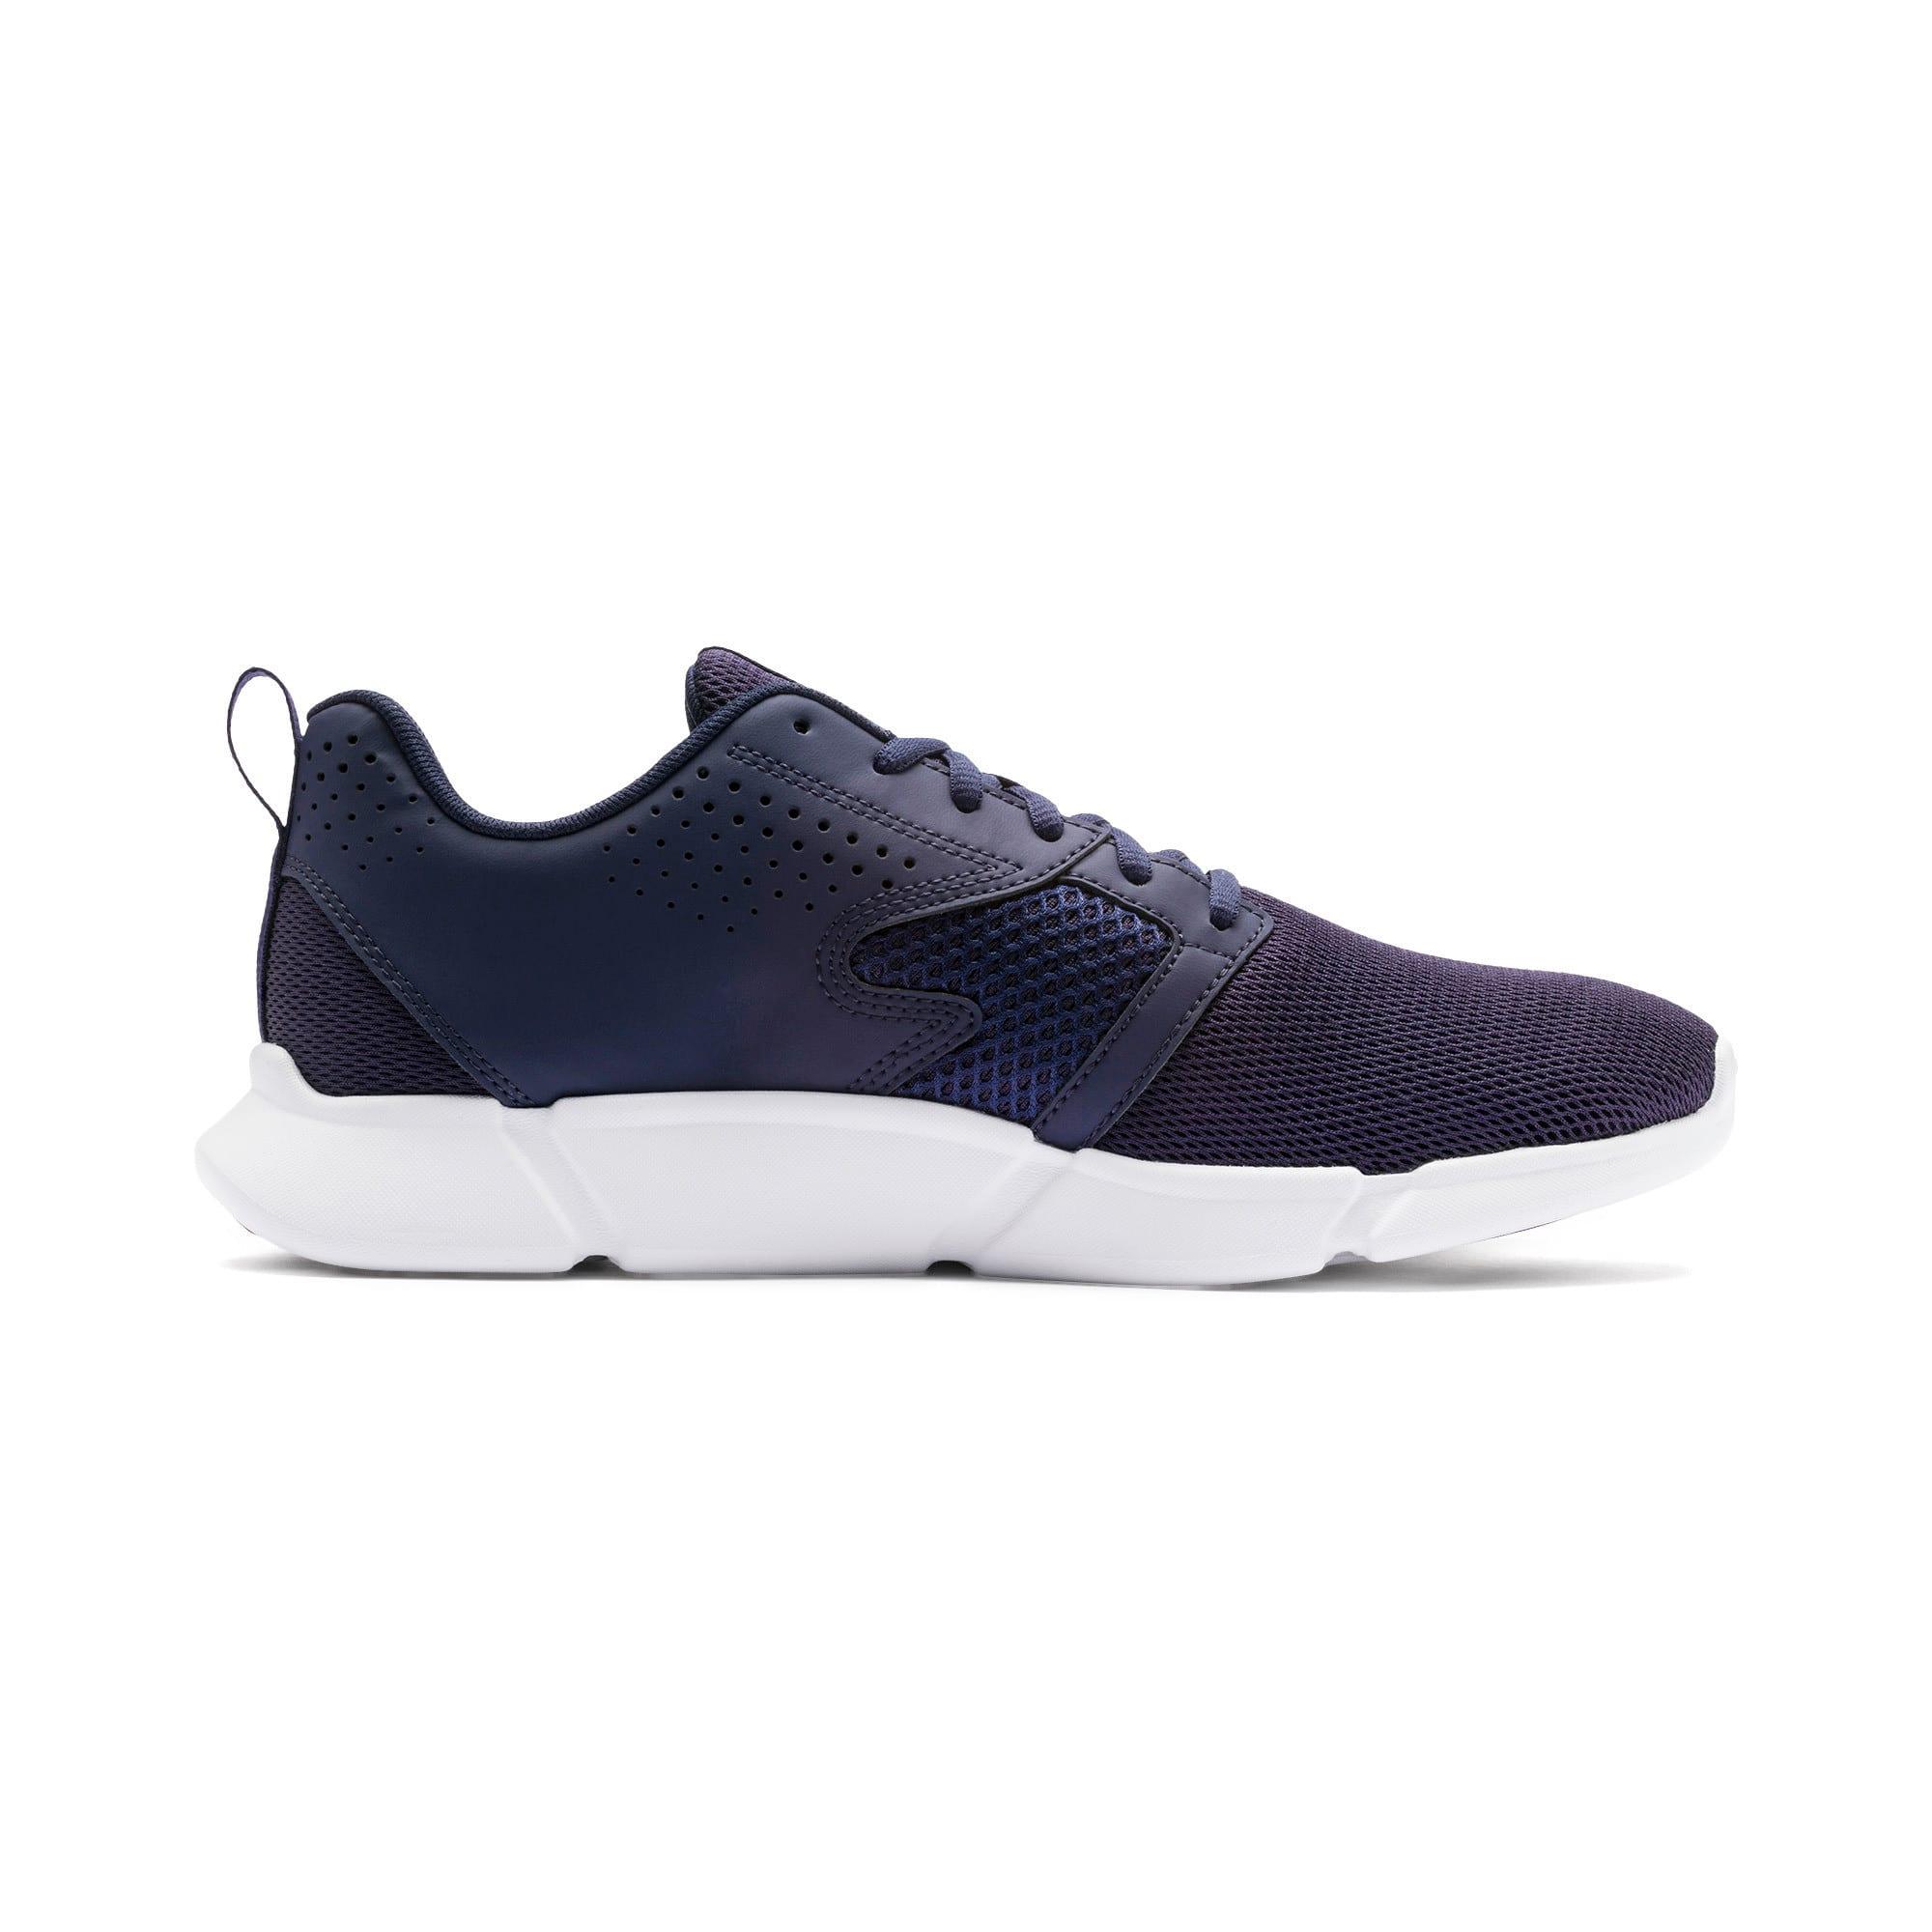 Thumbnail 7 of INTERFLEX Modern Running Shoes, Peacoat-Puma White, medium-IND